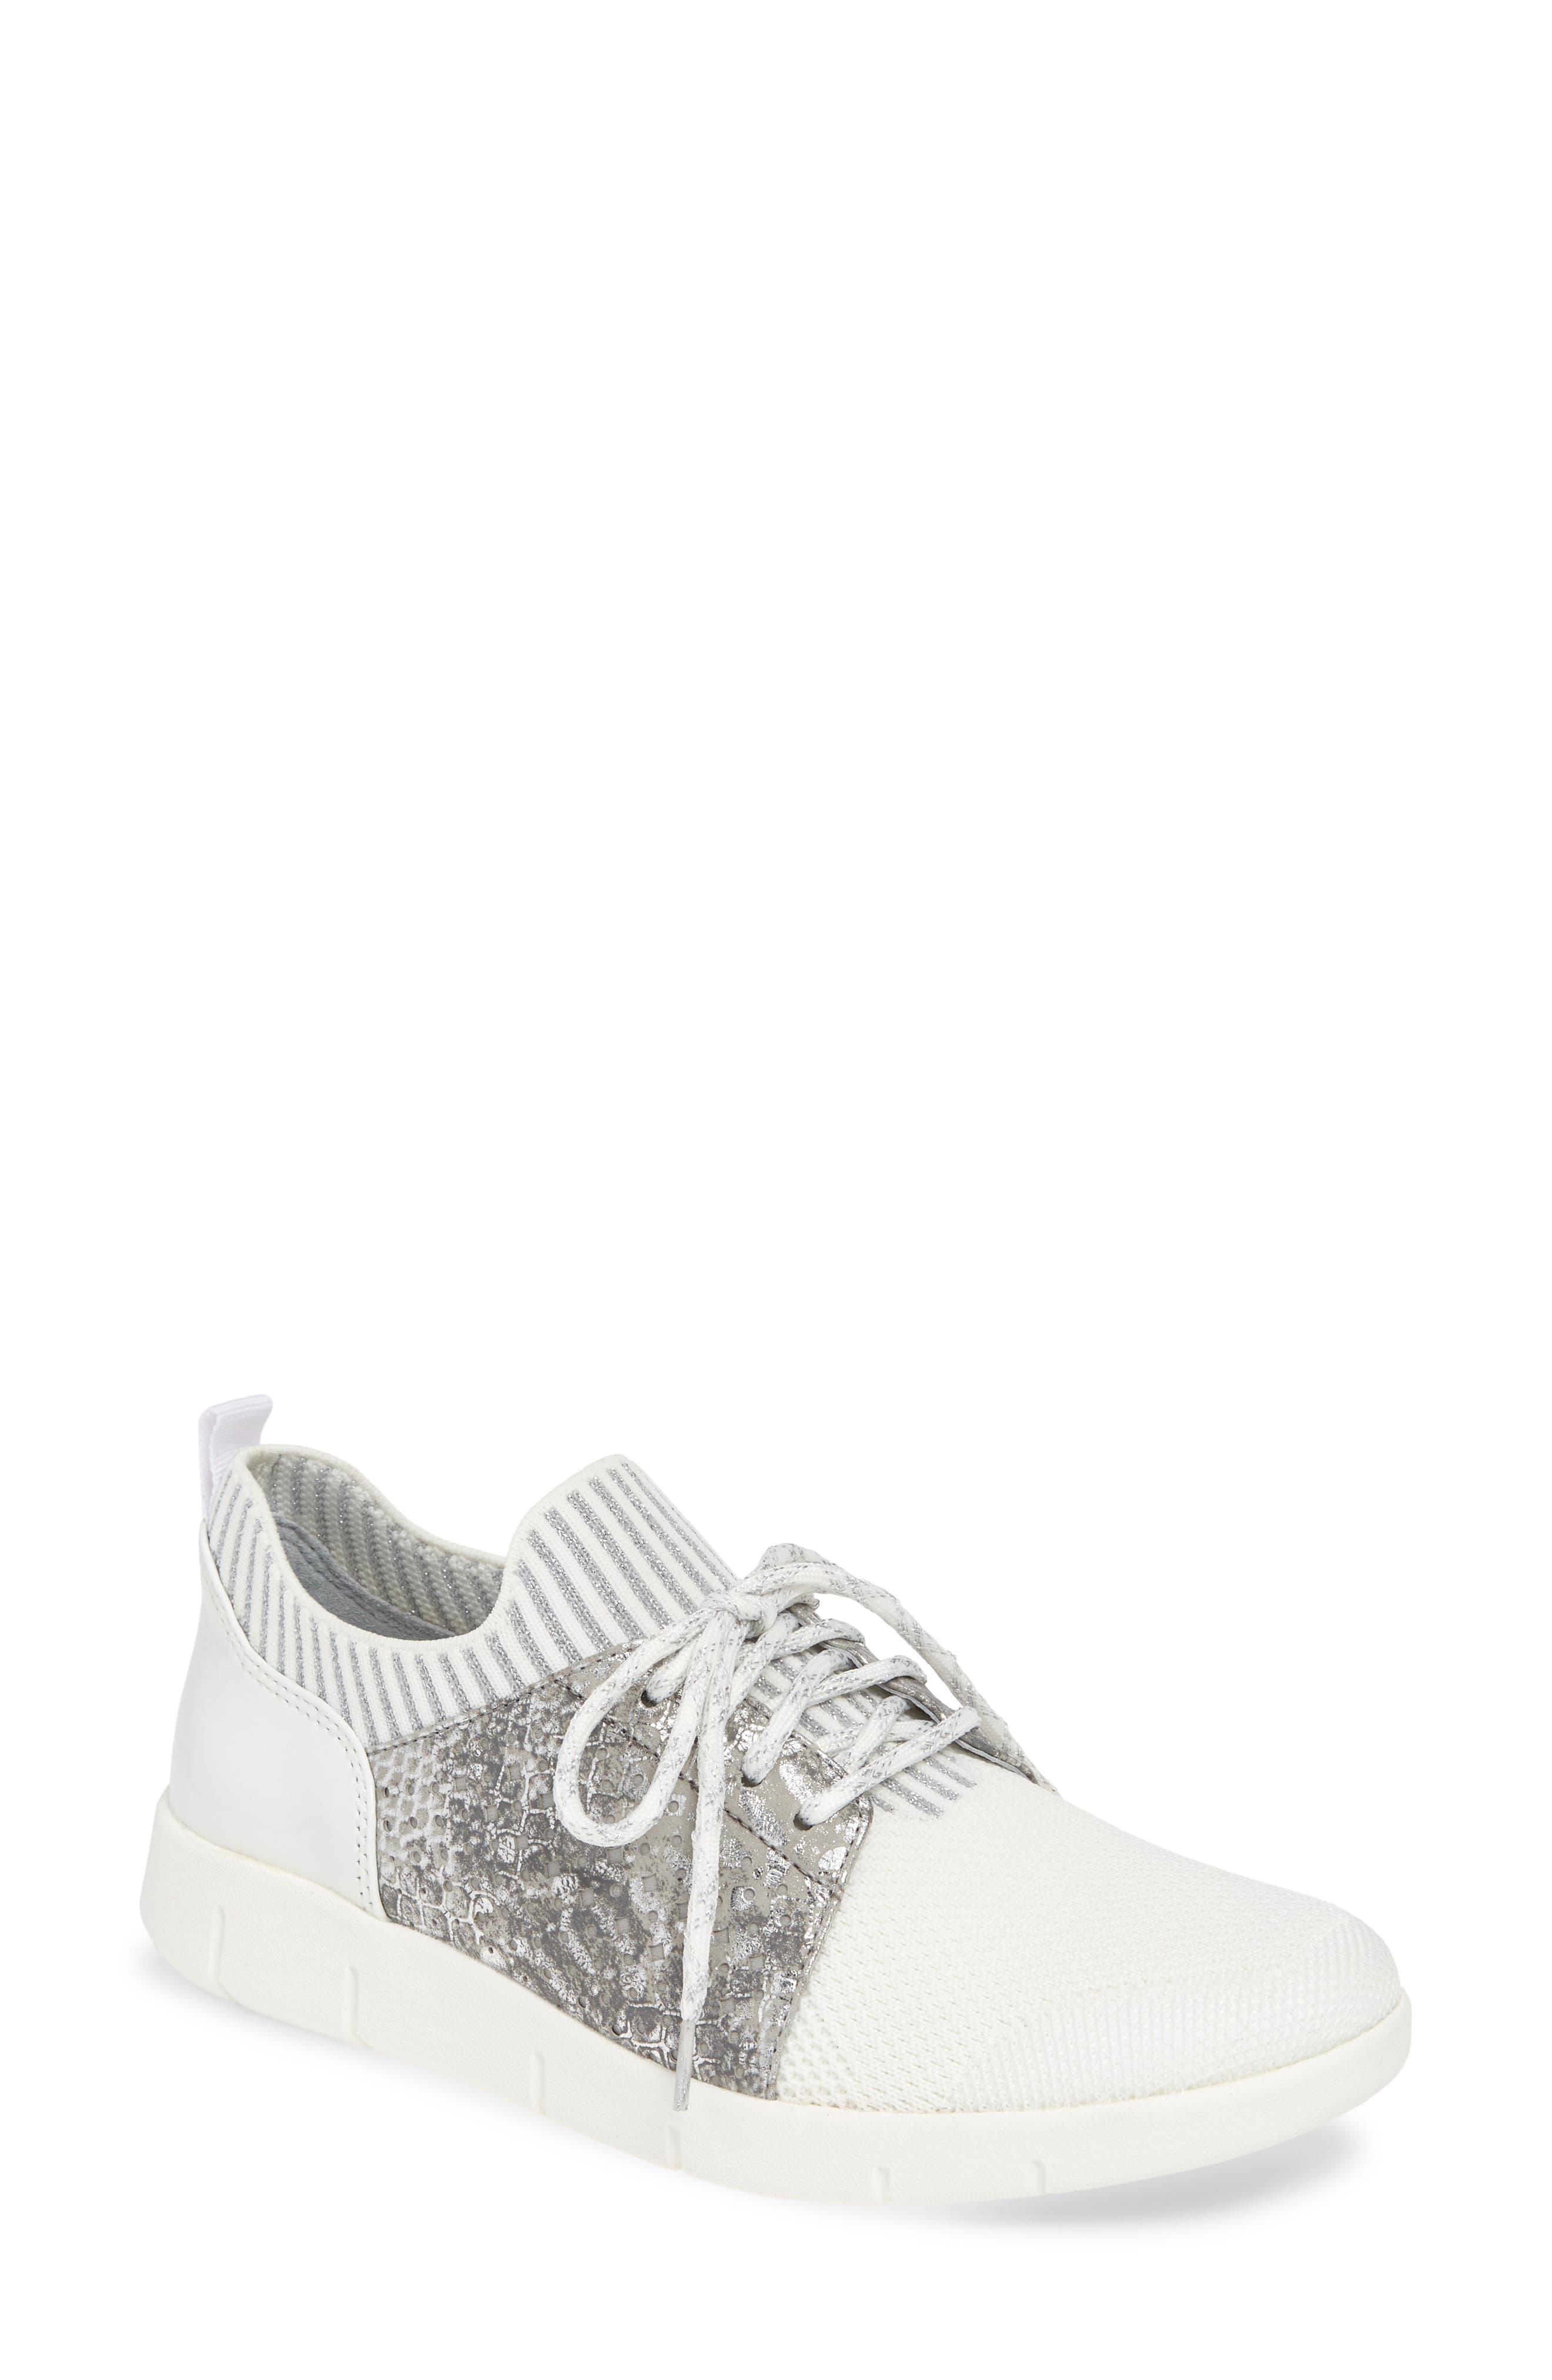 Johnston & Murphy Tamara Sneaker, White